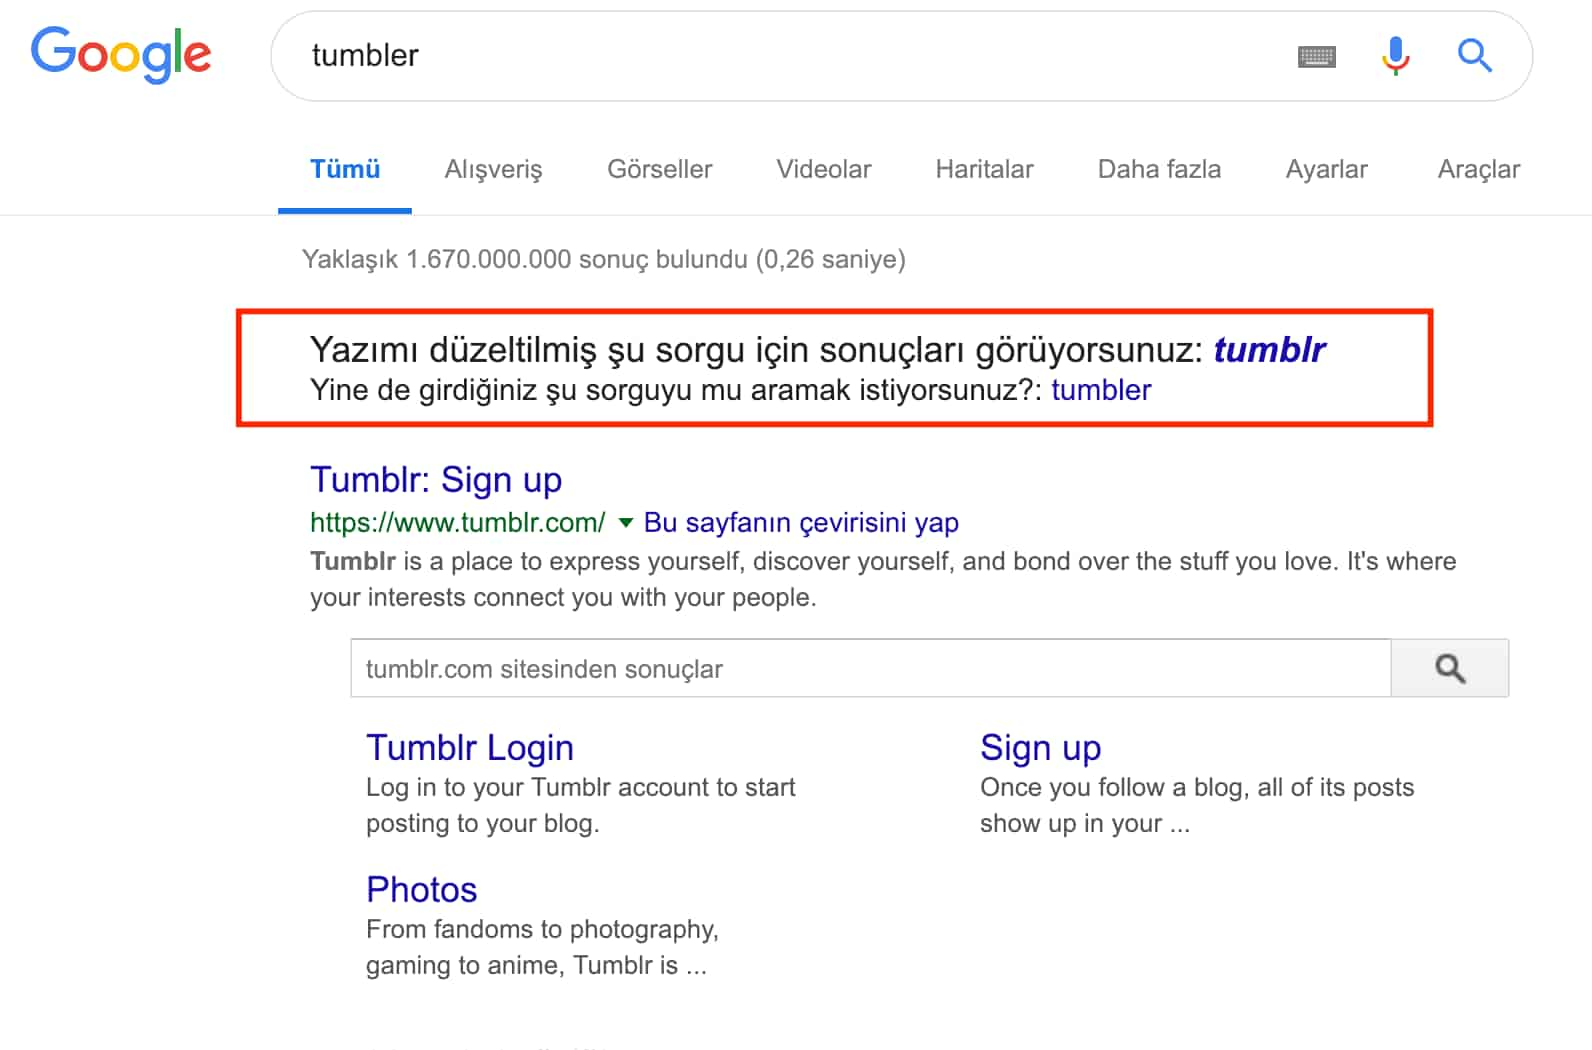 tumblr searching